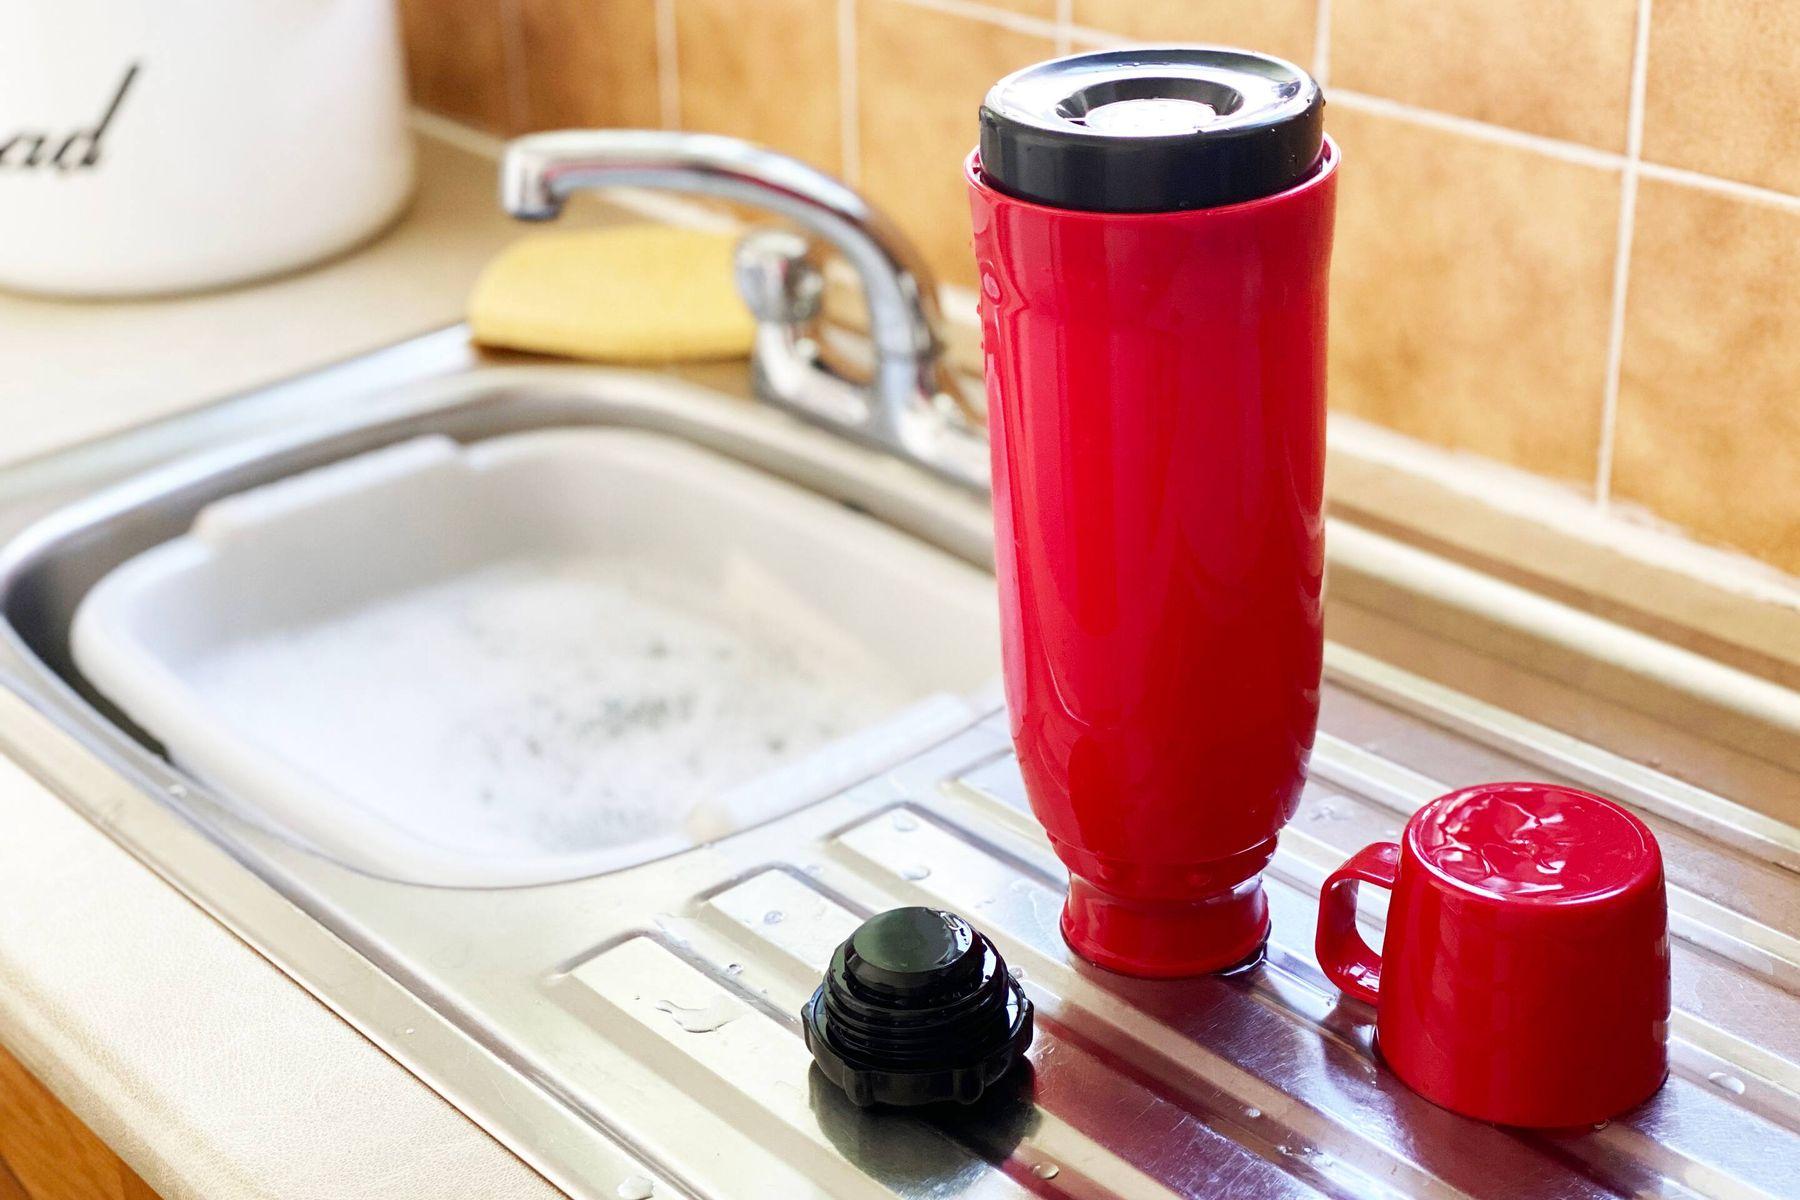 red bottle on a sinck